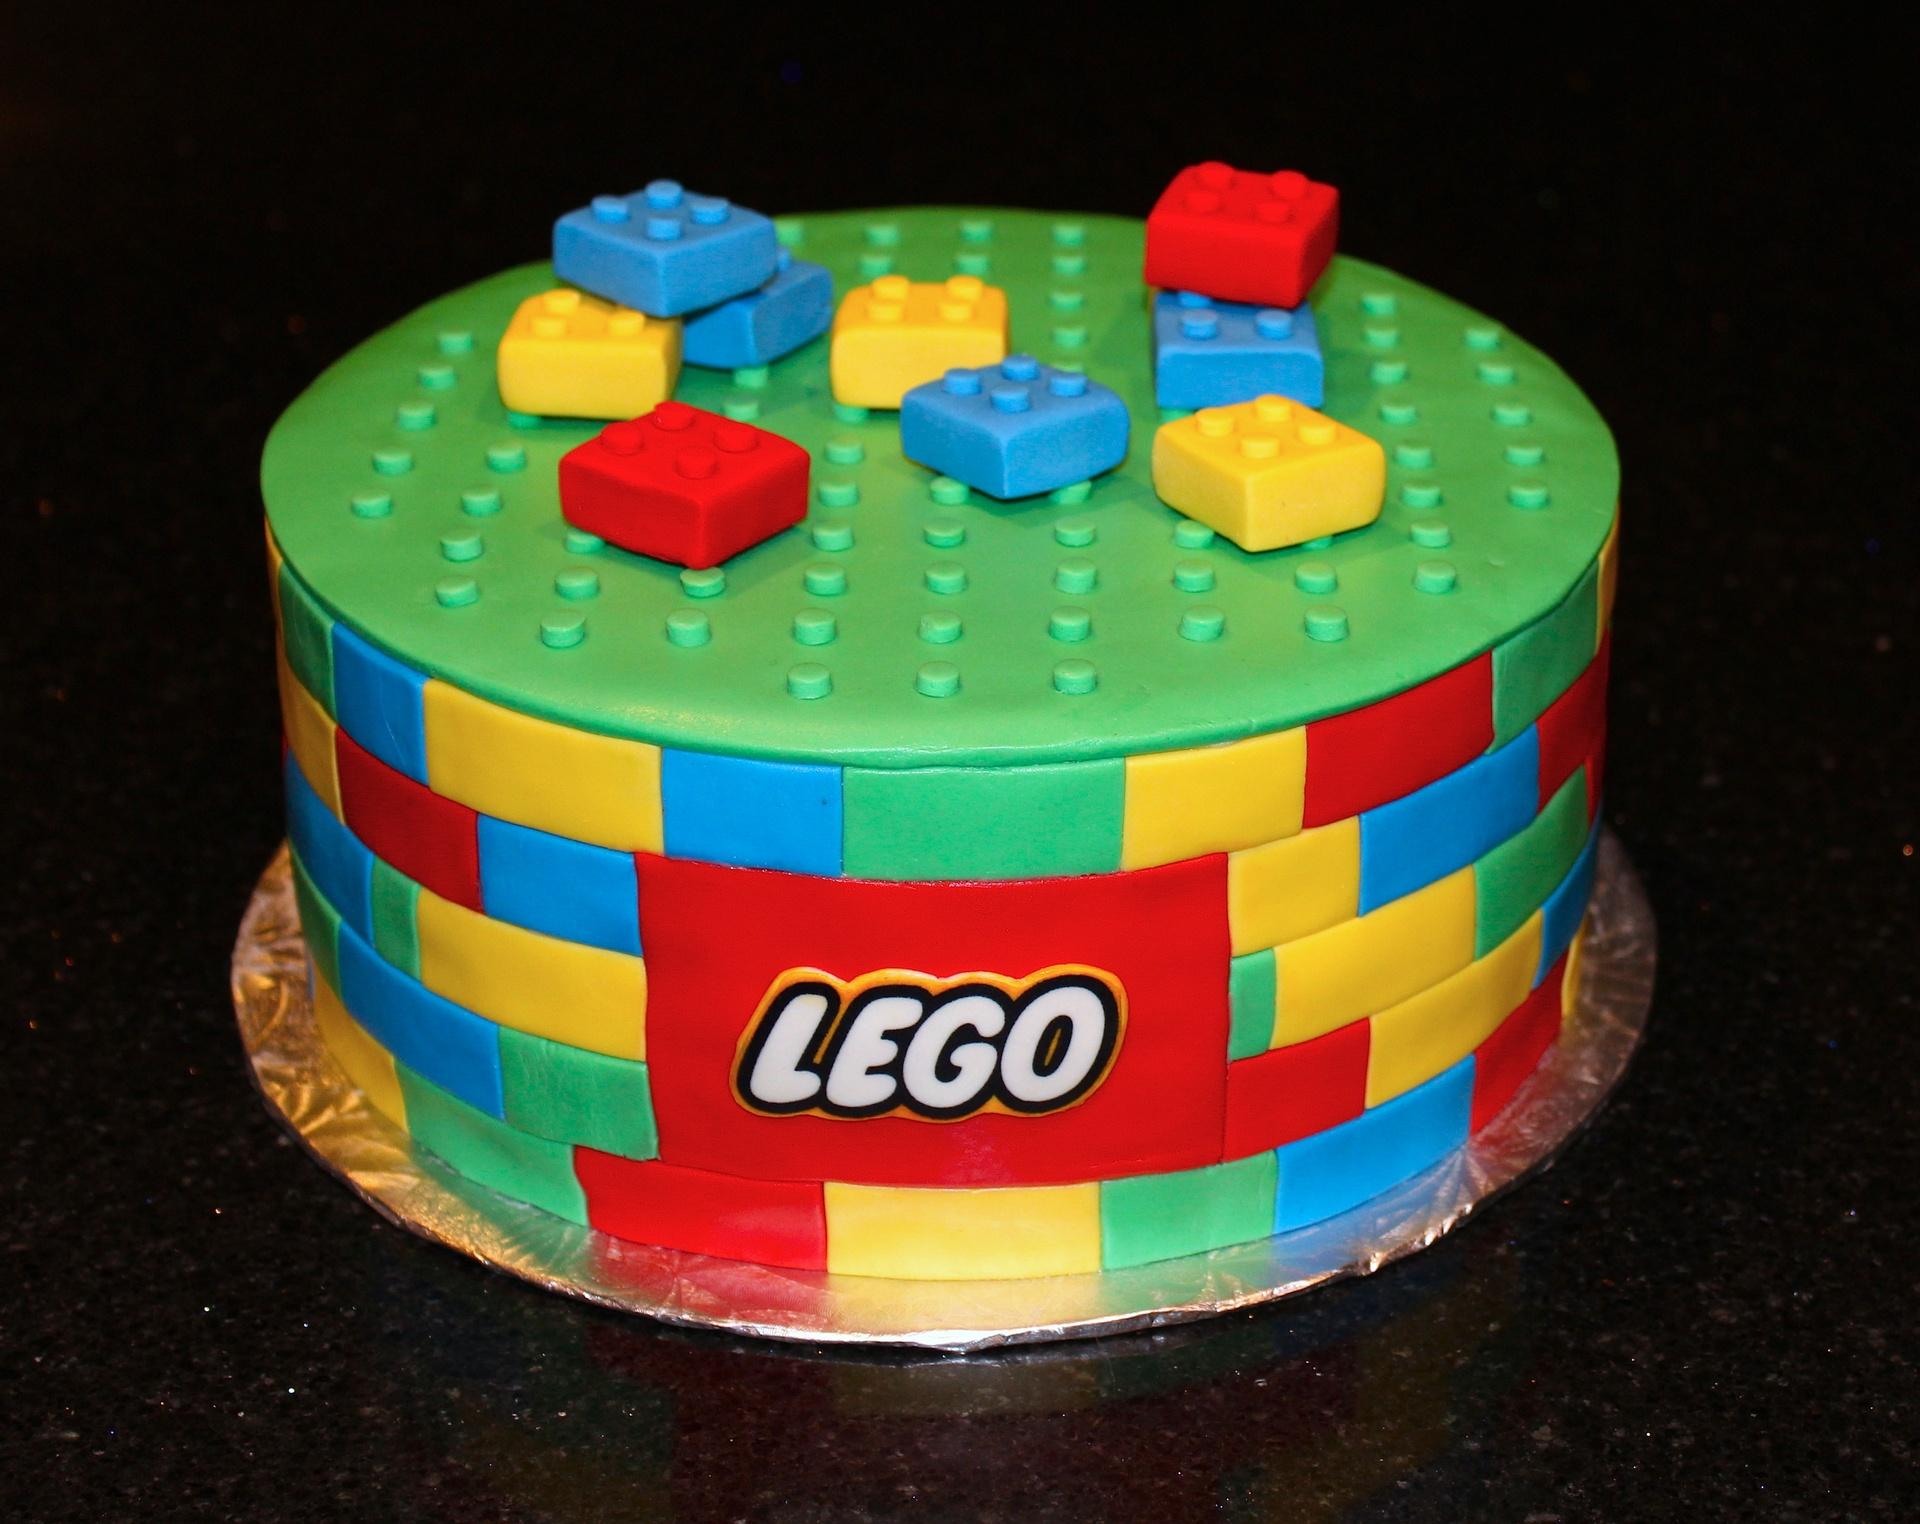 Lego Themed Groom's Cake